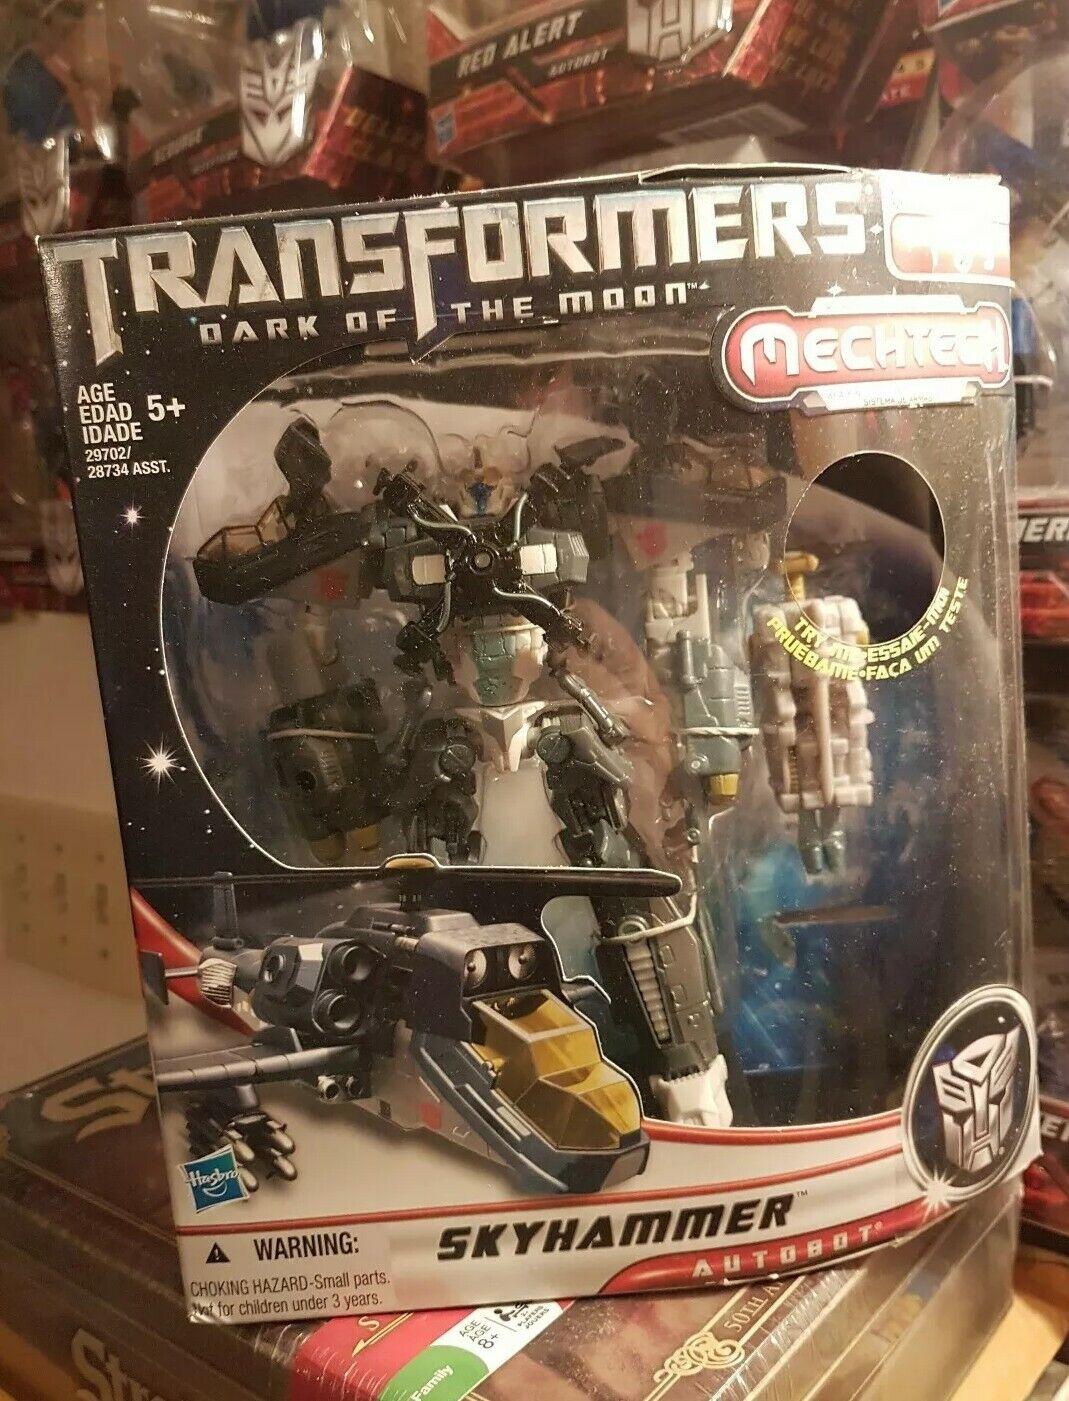 Transformers Dark of the Moon Skyhammer MISB